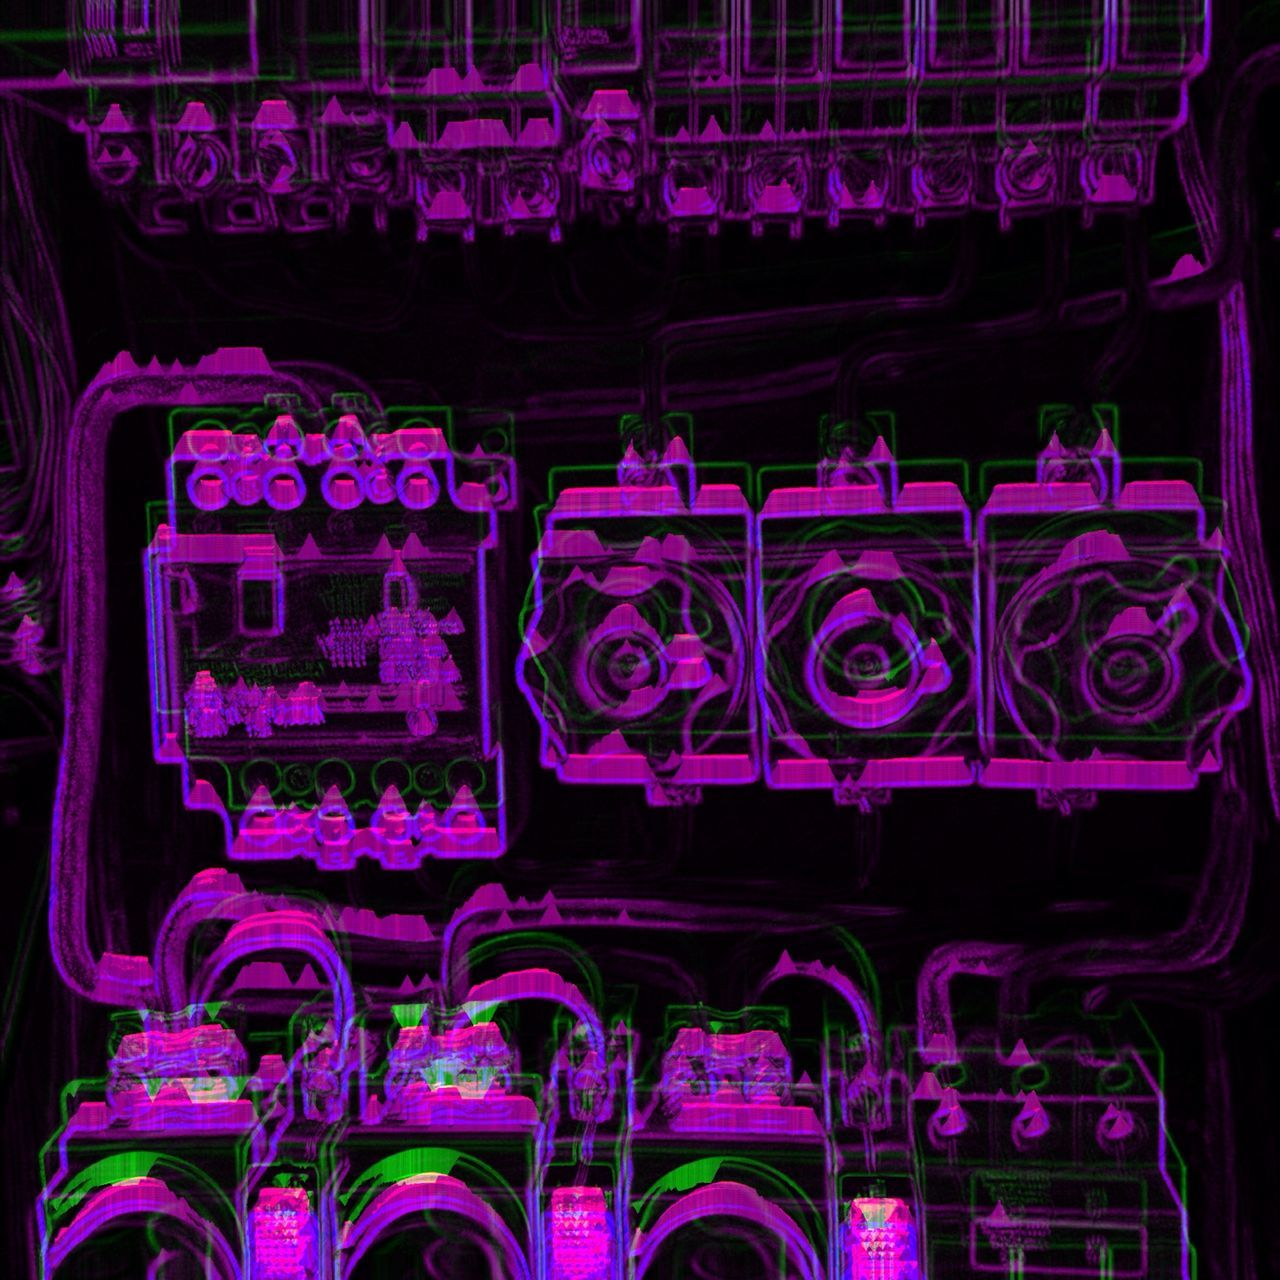 Machine Interior Illuminated With Violet Light